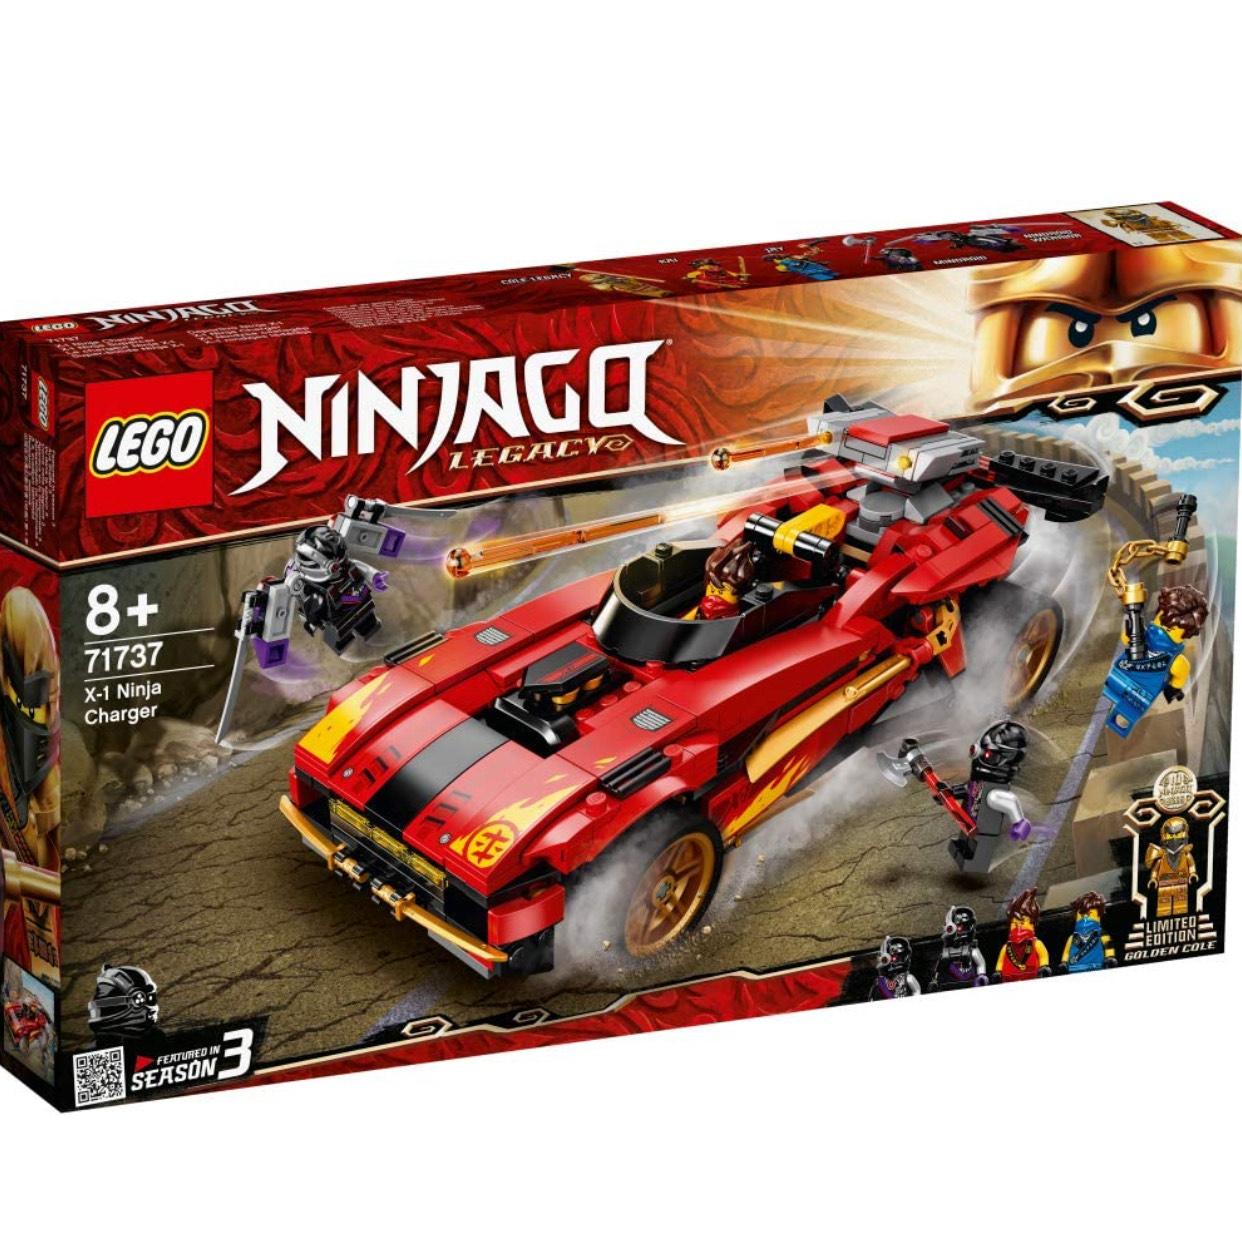 LEGO NINJAGO 71737 Legacy X-1 Ninja Charger Ninja Car Toy and Motorcycle with Cole Golden Figure £34.95 at Amazon